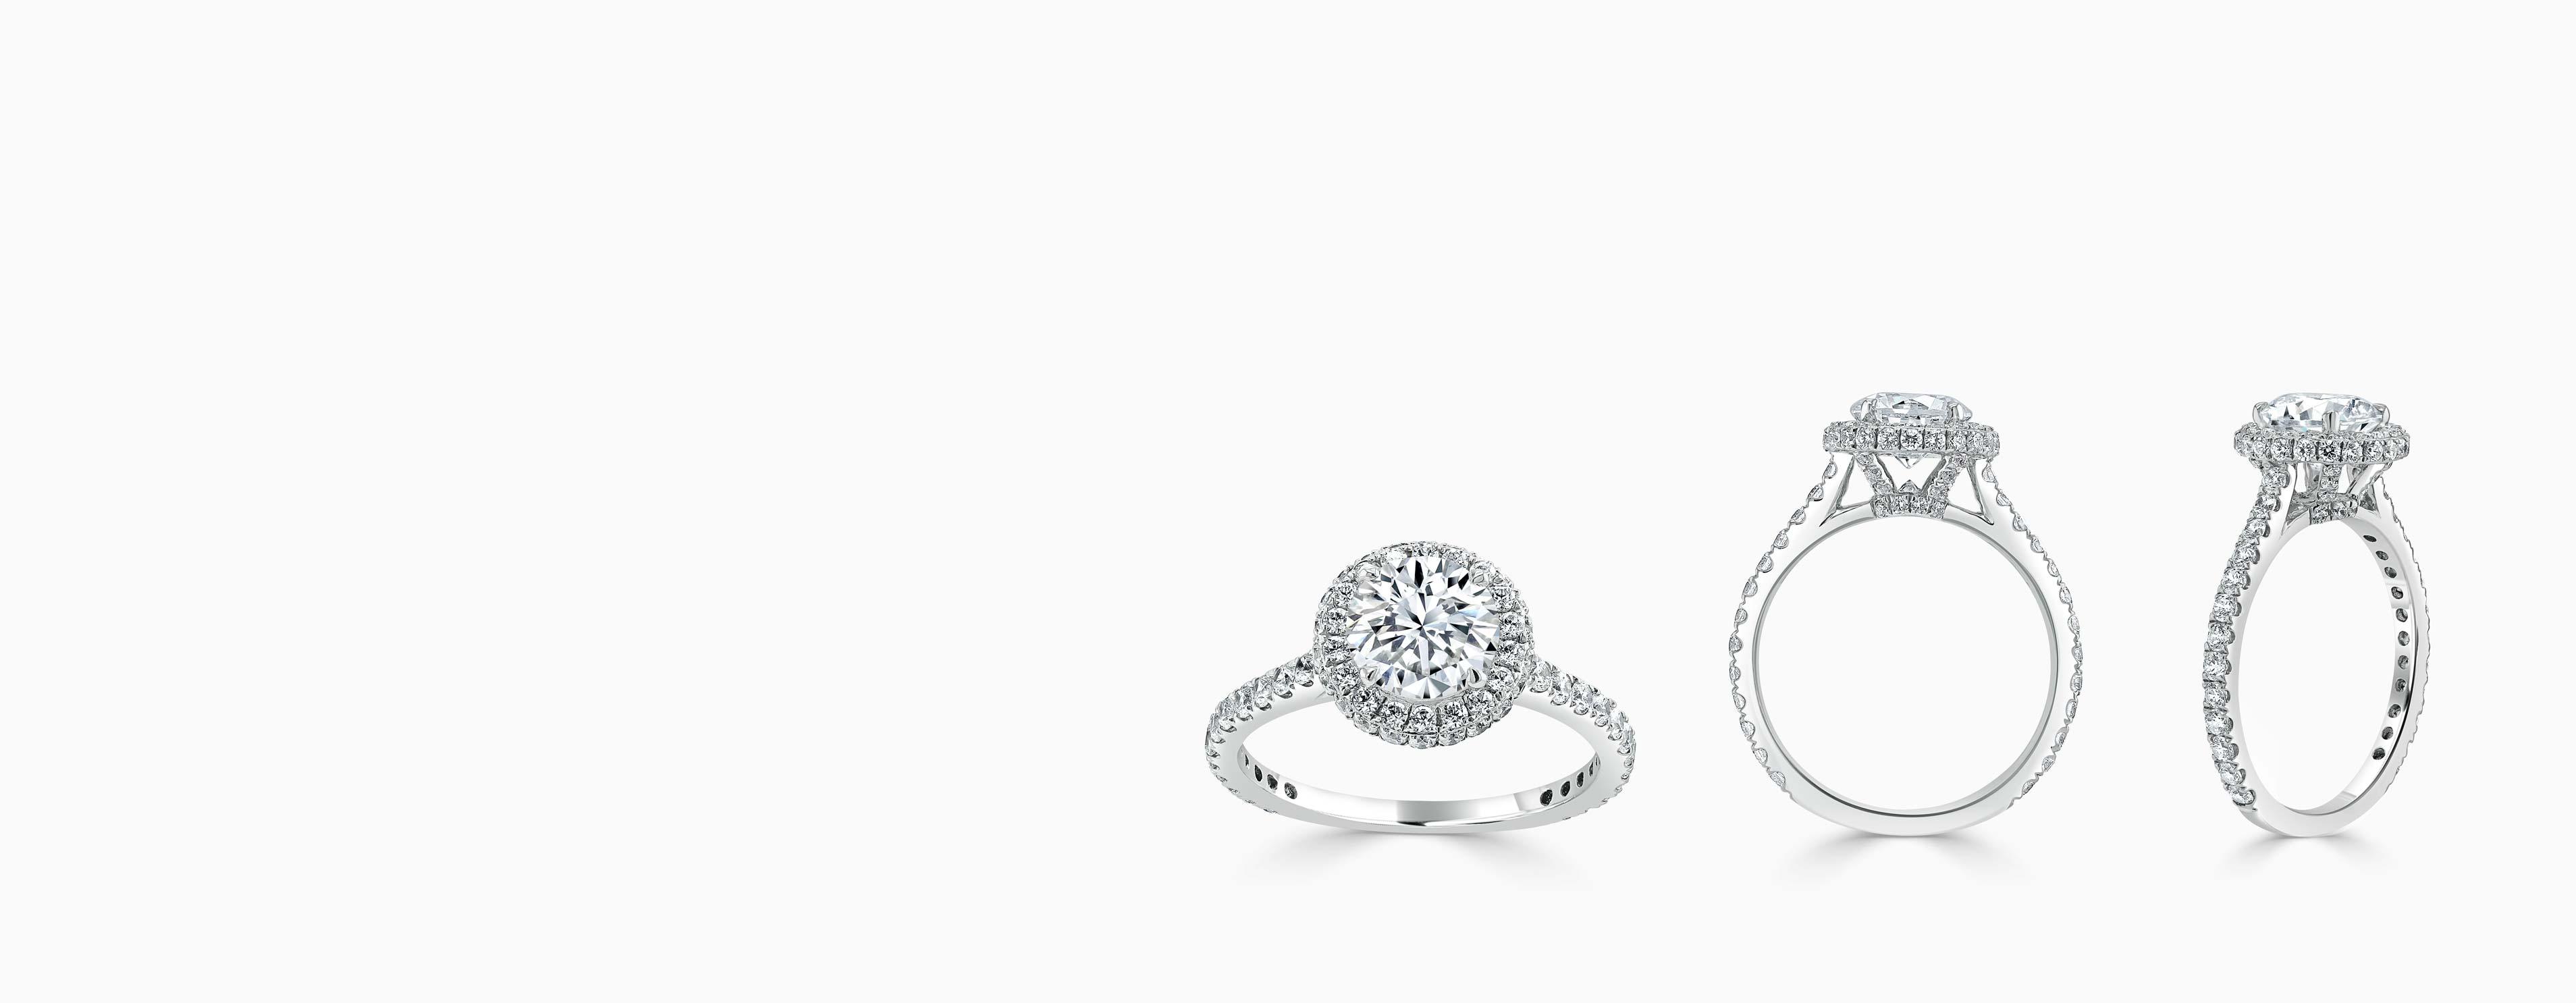 Halo Diamond Engagement Rings